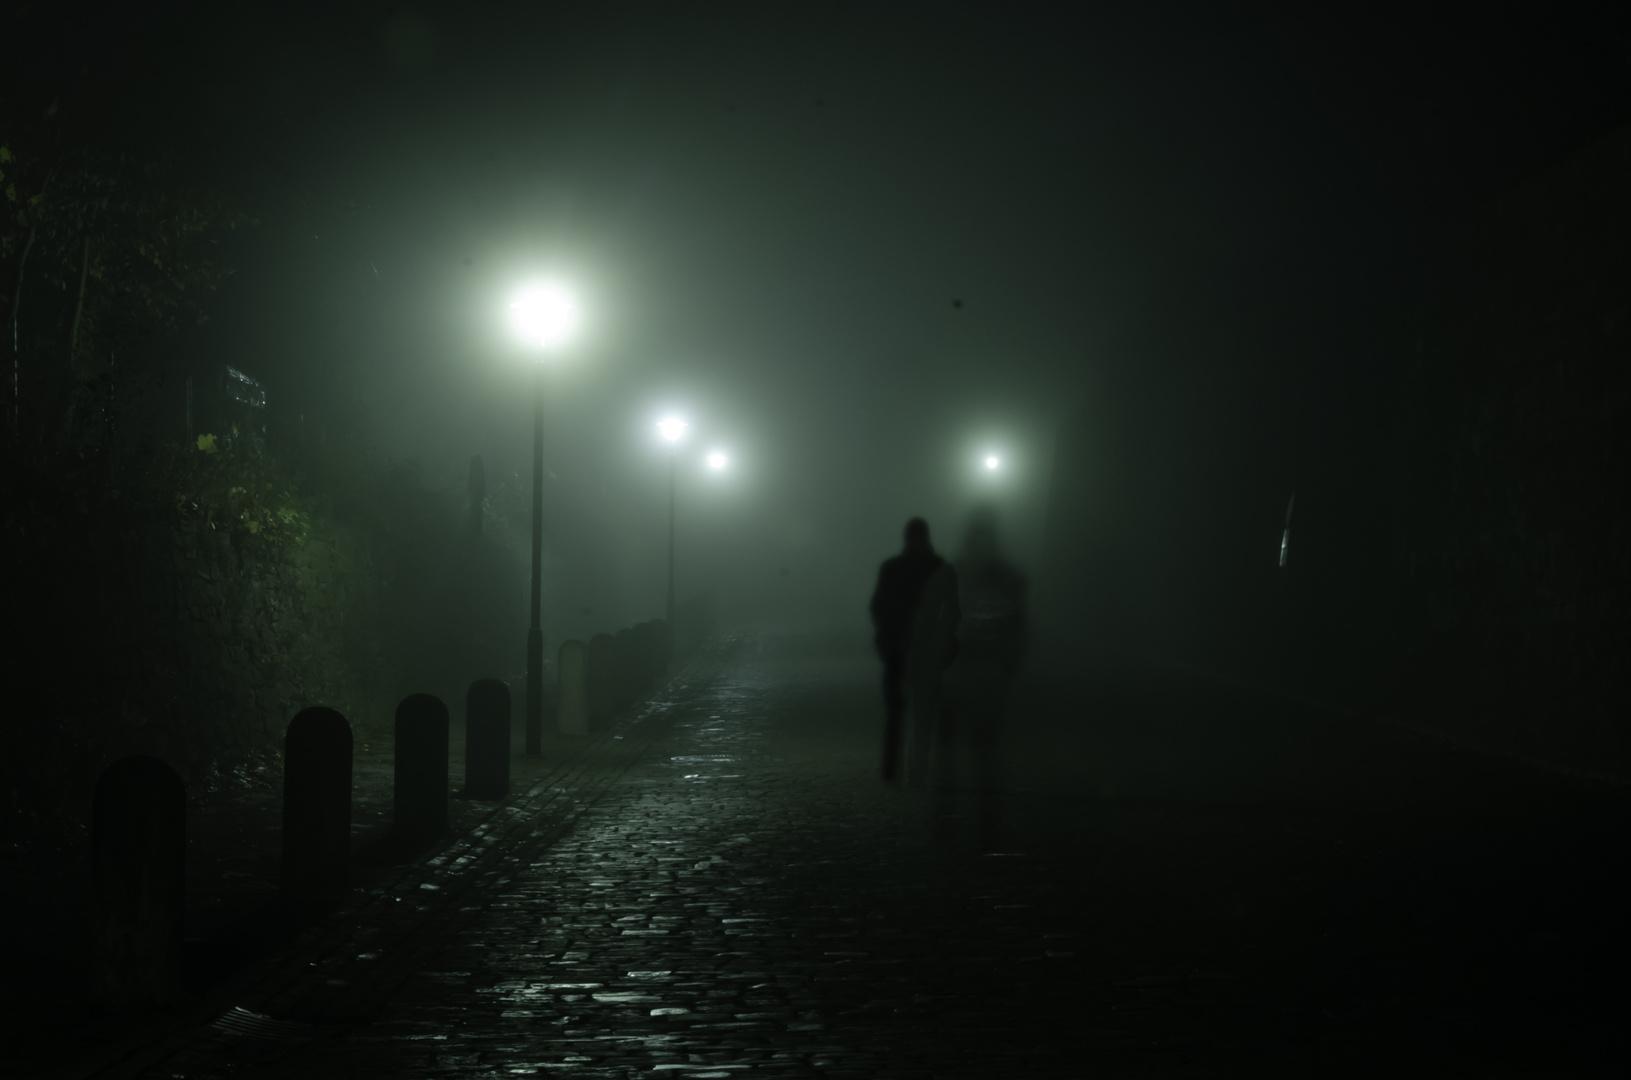 Lights and Lies